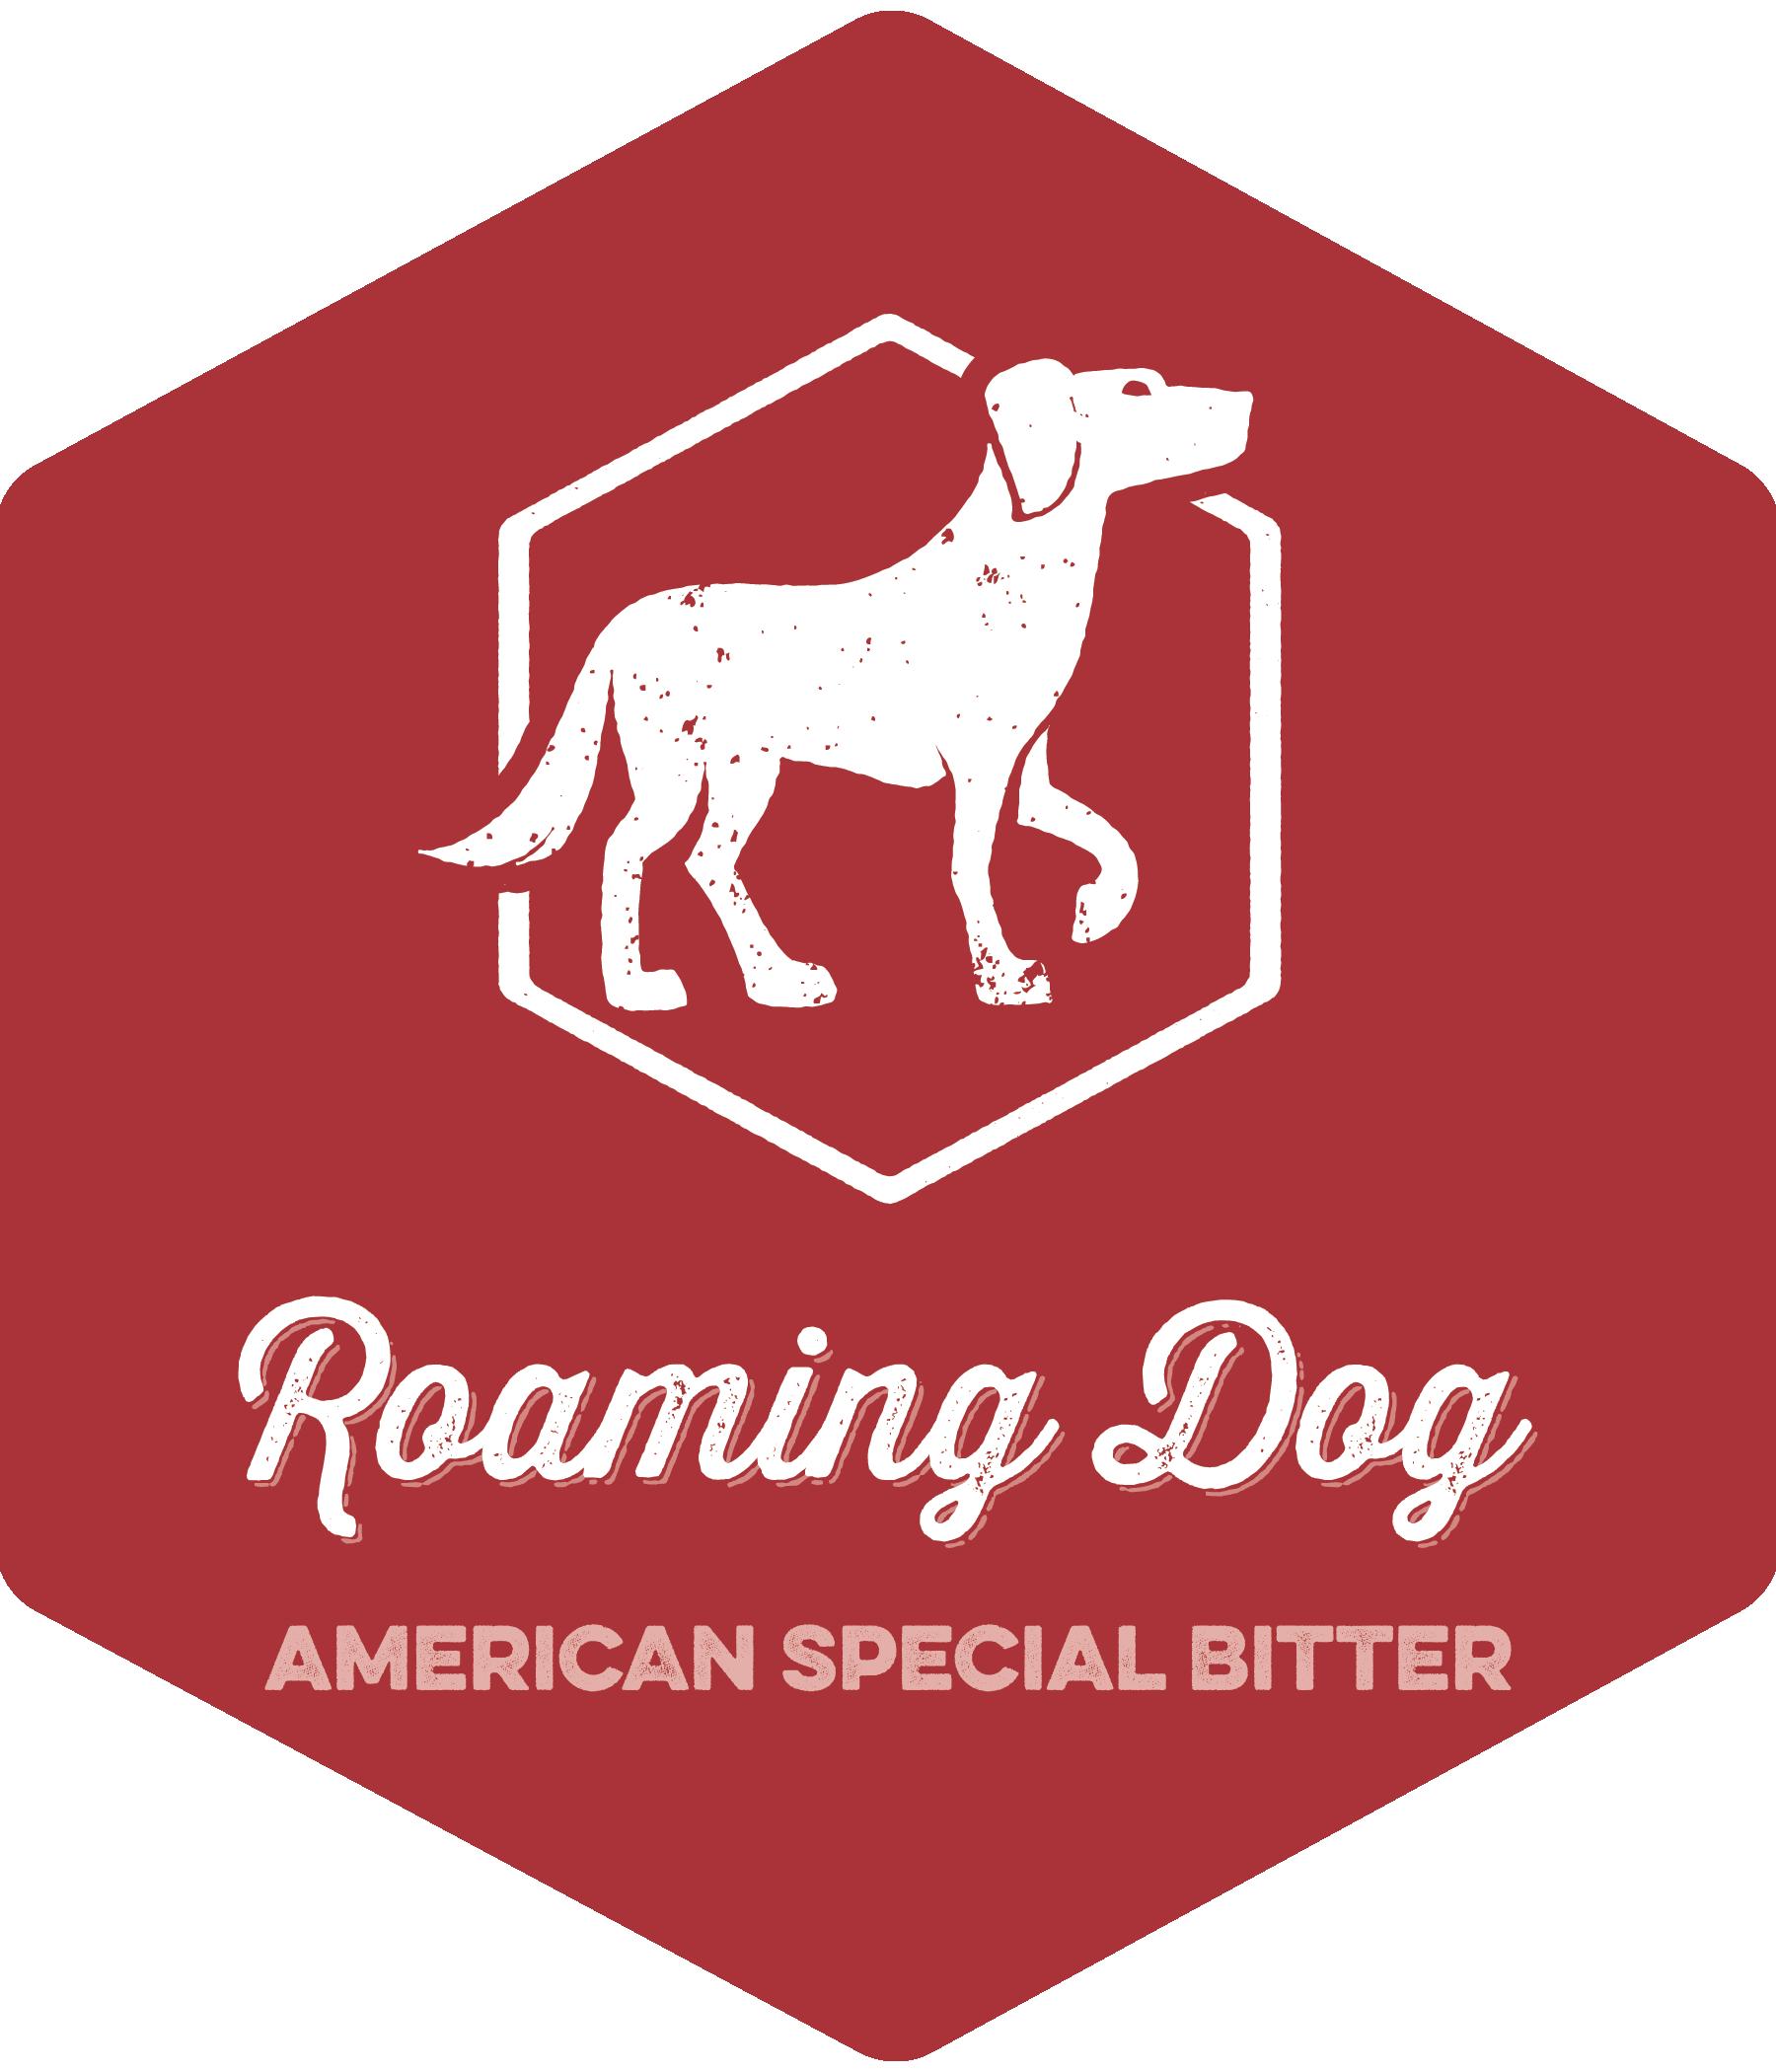 Roaming+dog+